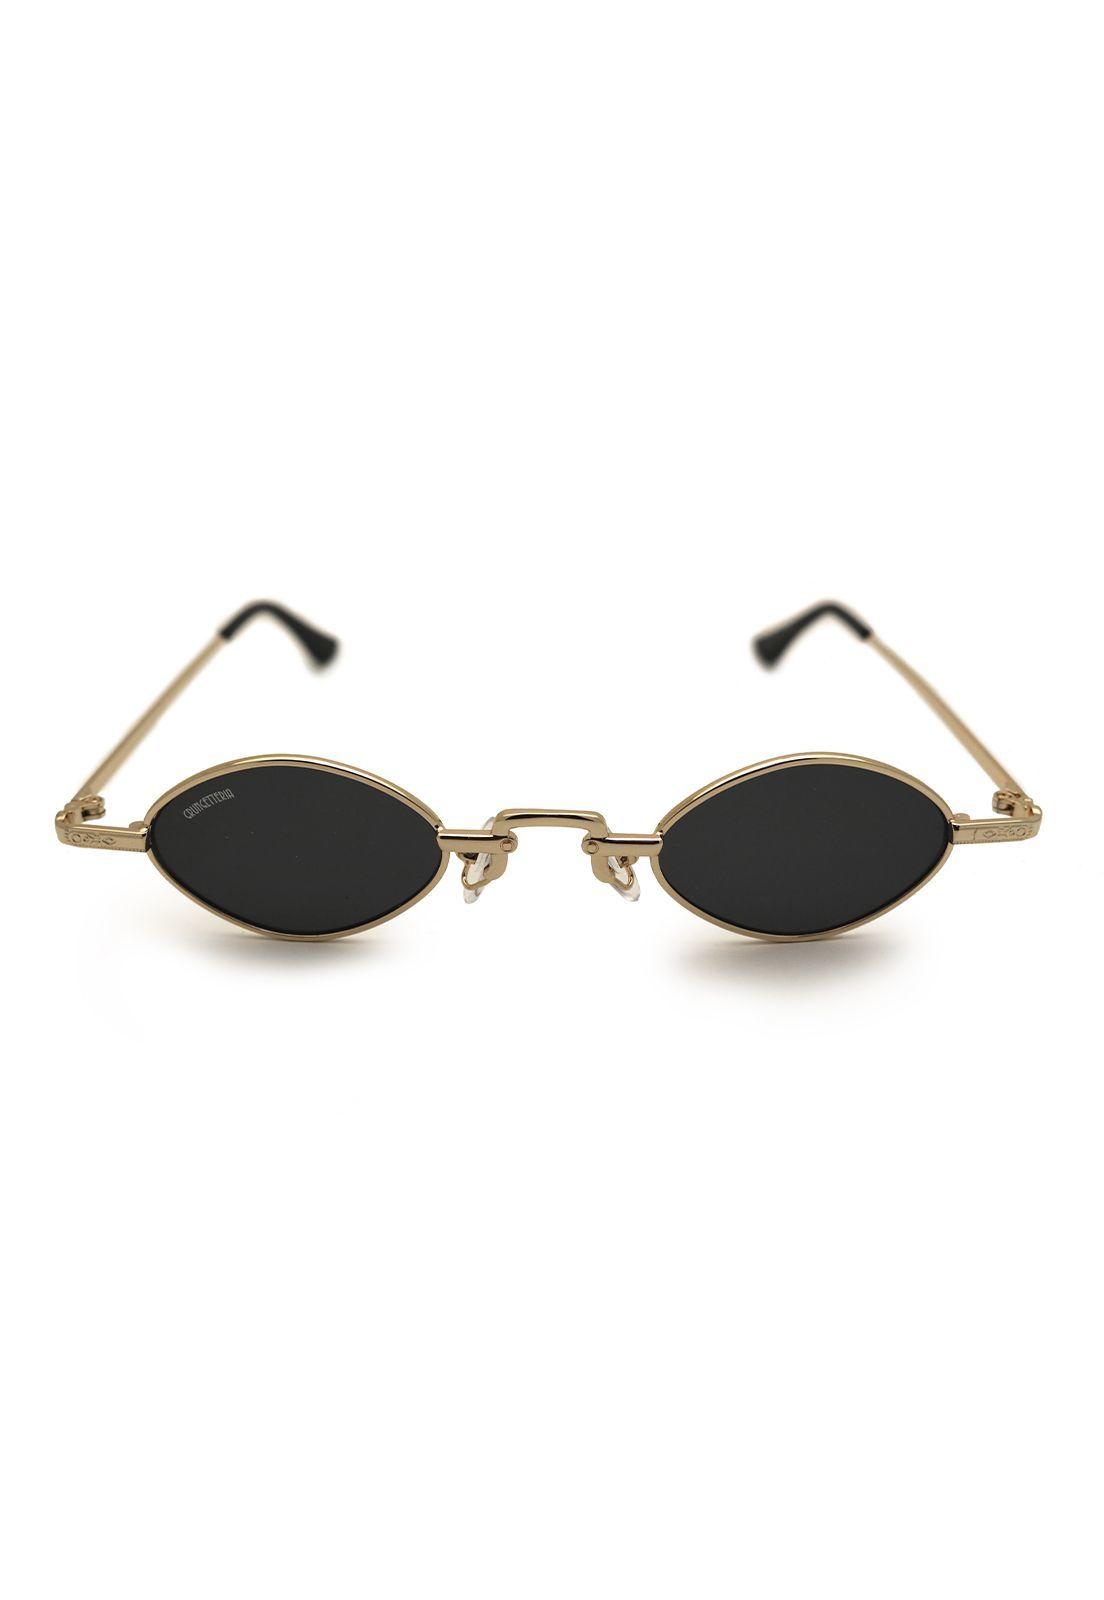 Óculos de Sol Grungetteria Osval Dourado